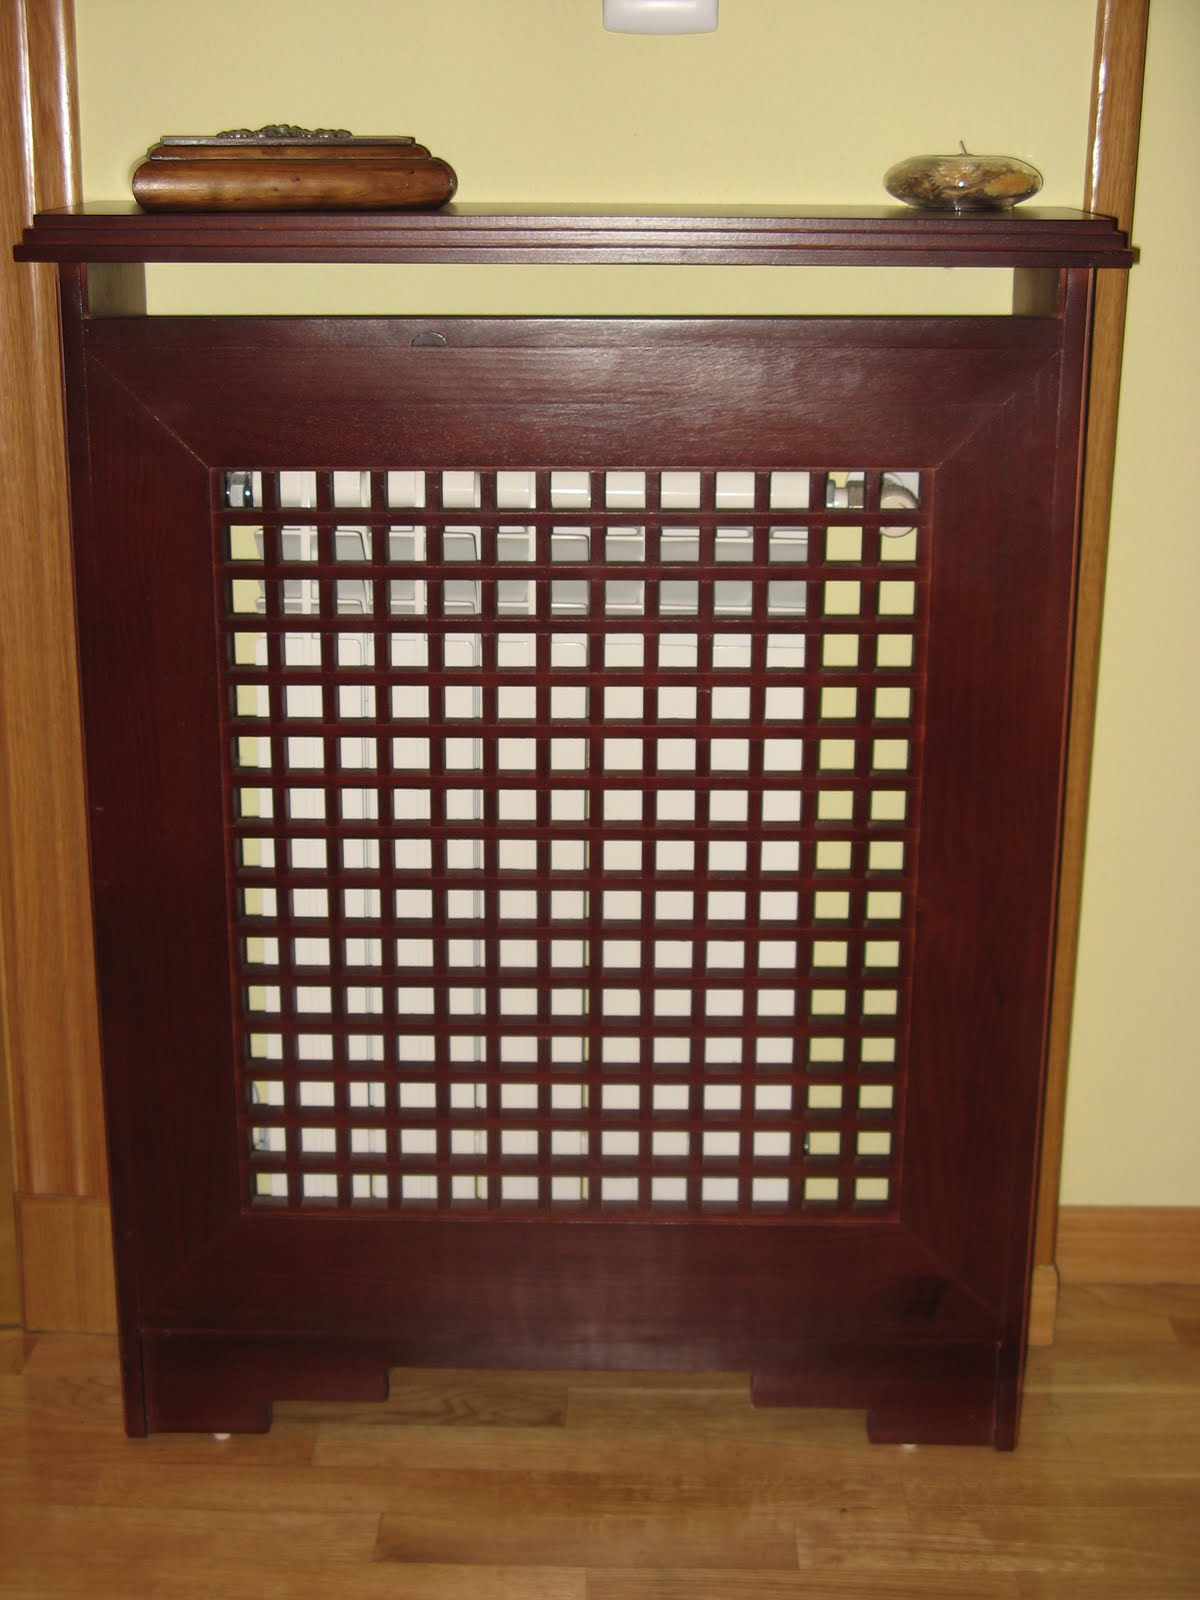 Cubreradiadores de madera carpintero sevilla 665 848 - Muebles a medida sevilla ...